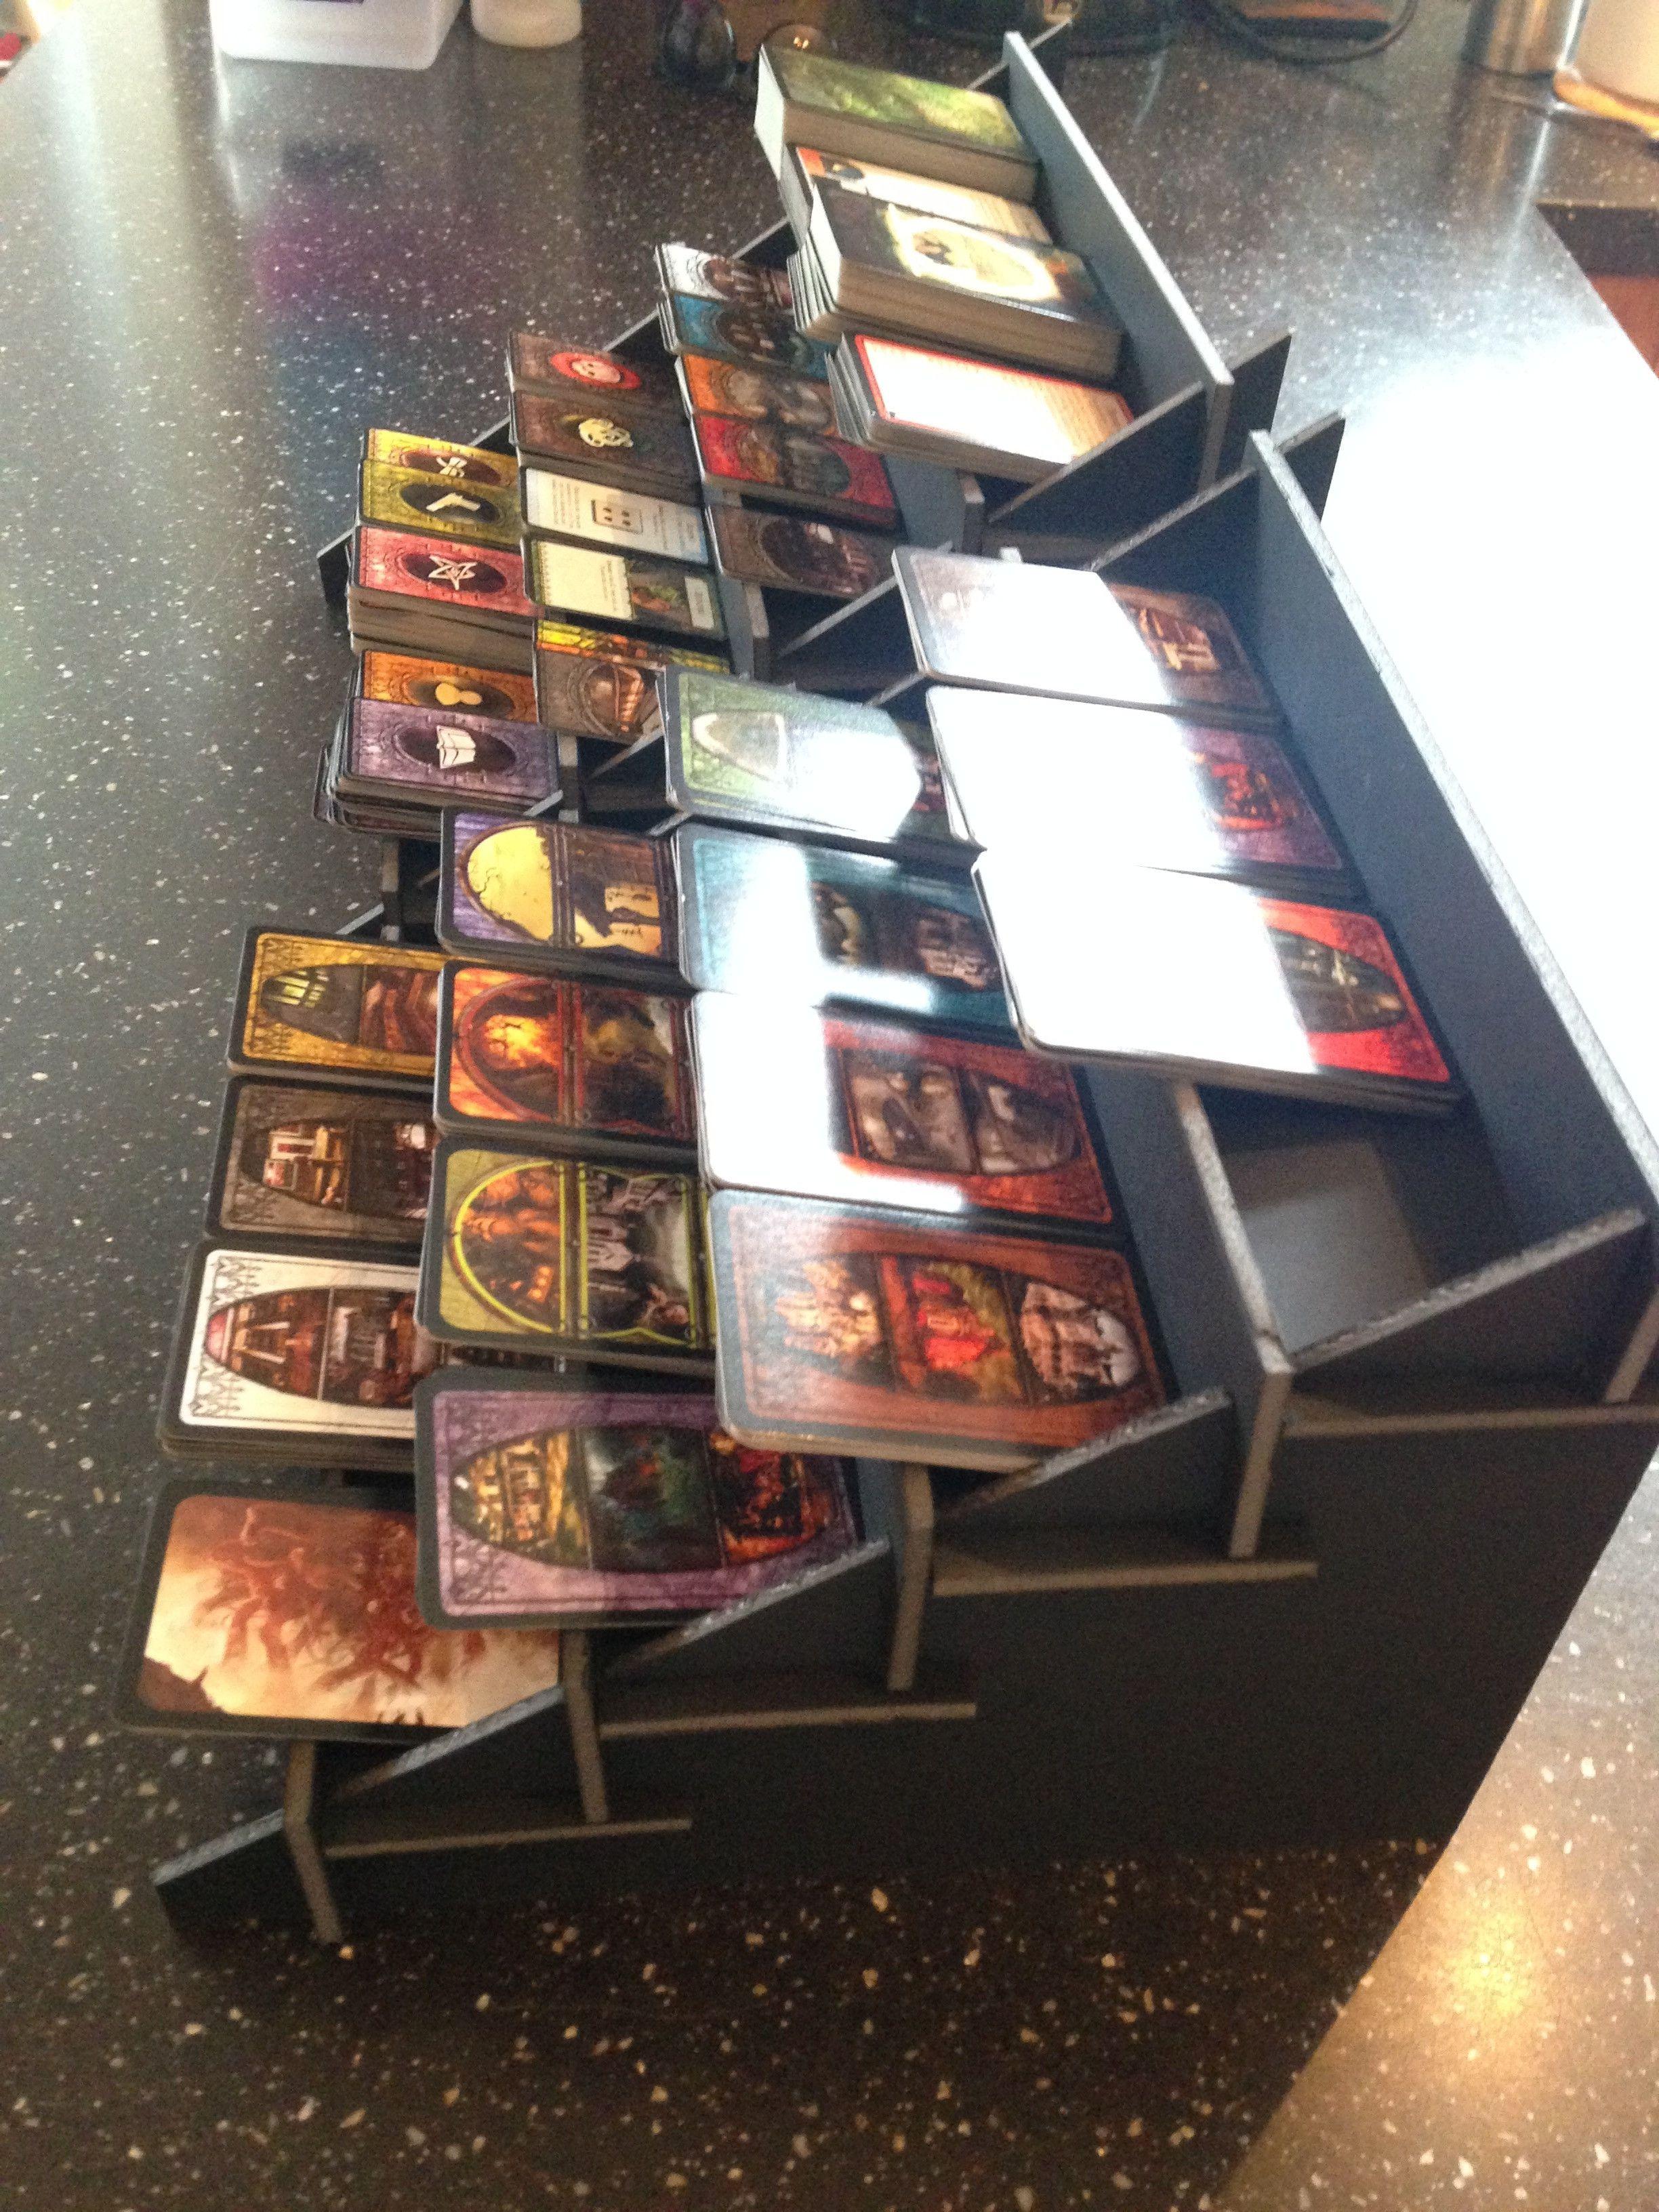 card stands imgur arkham horror cards shown - Cuisine En Rkham